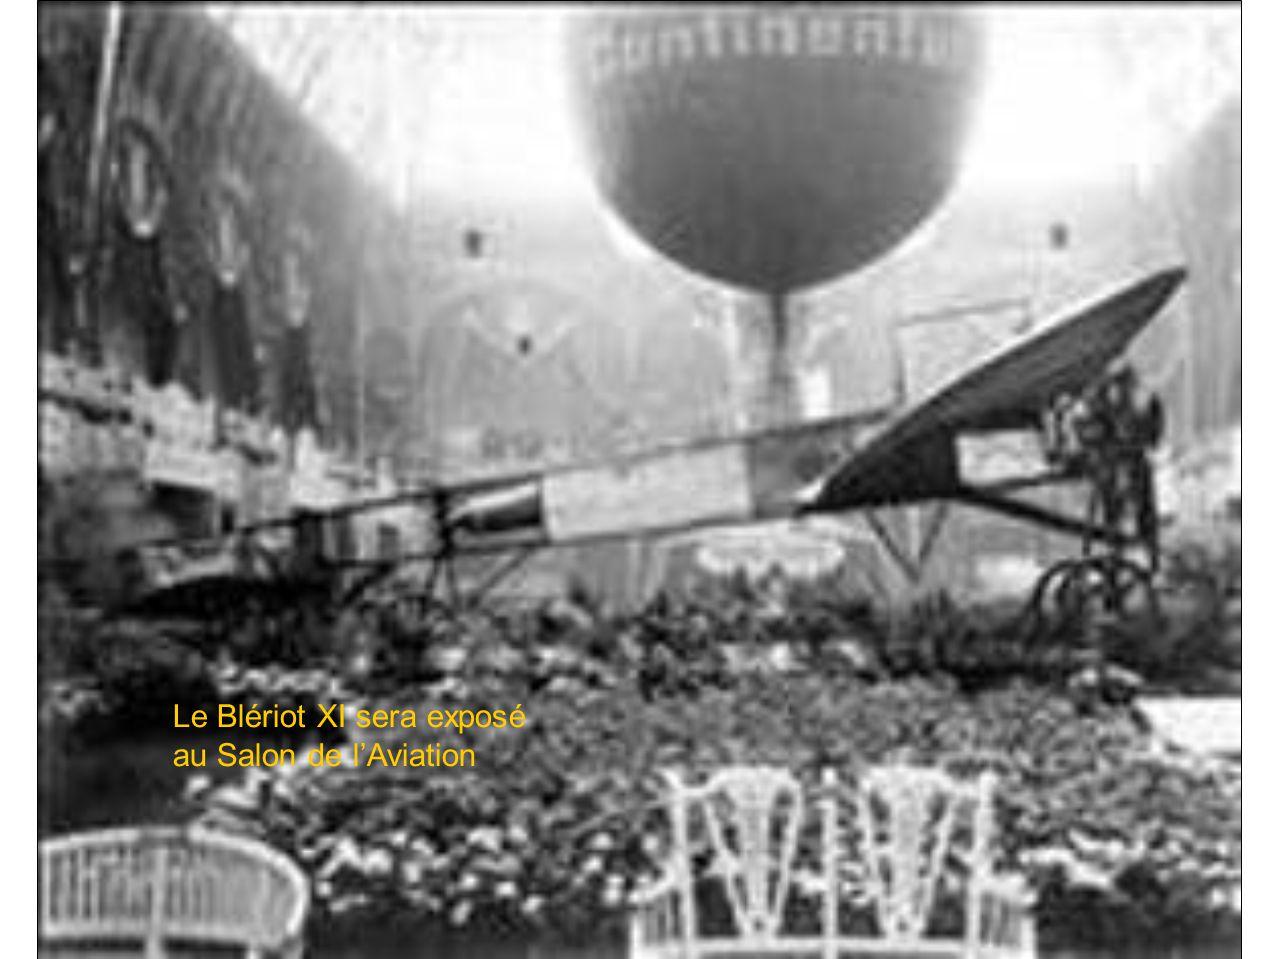 Le Blériot XI sera exposé au Salon de l'Aviation